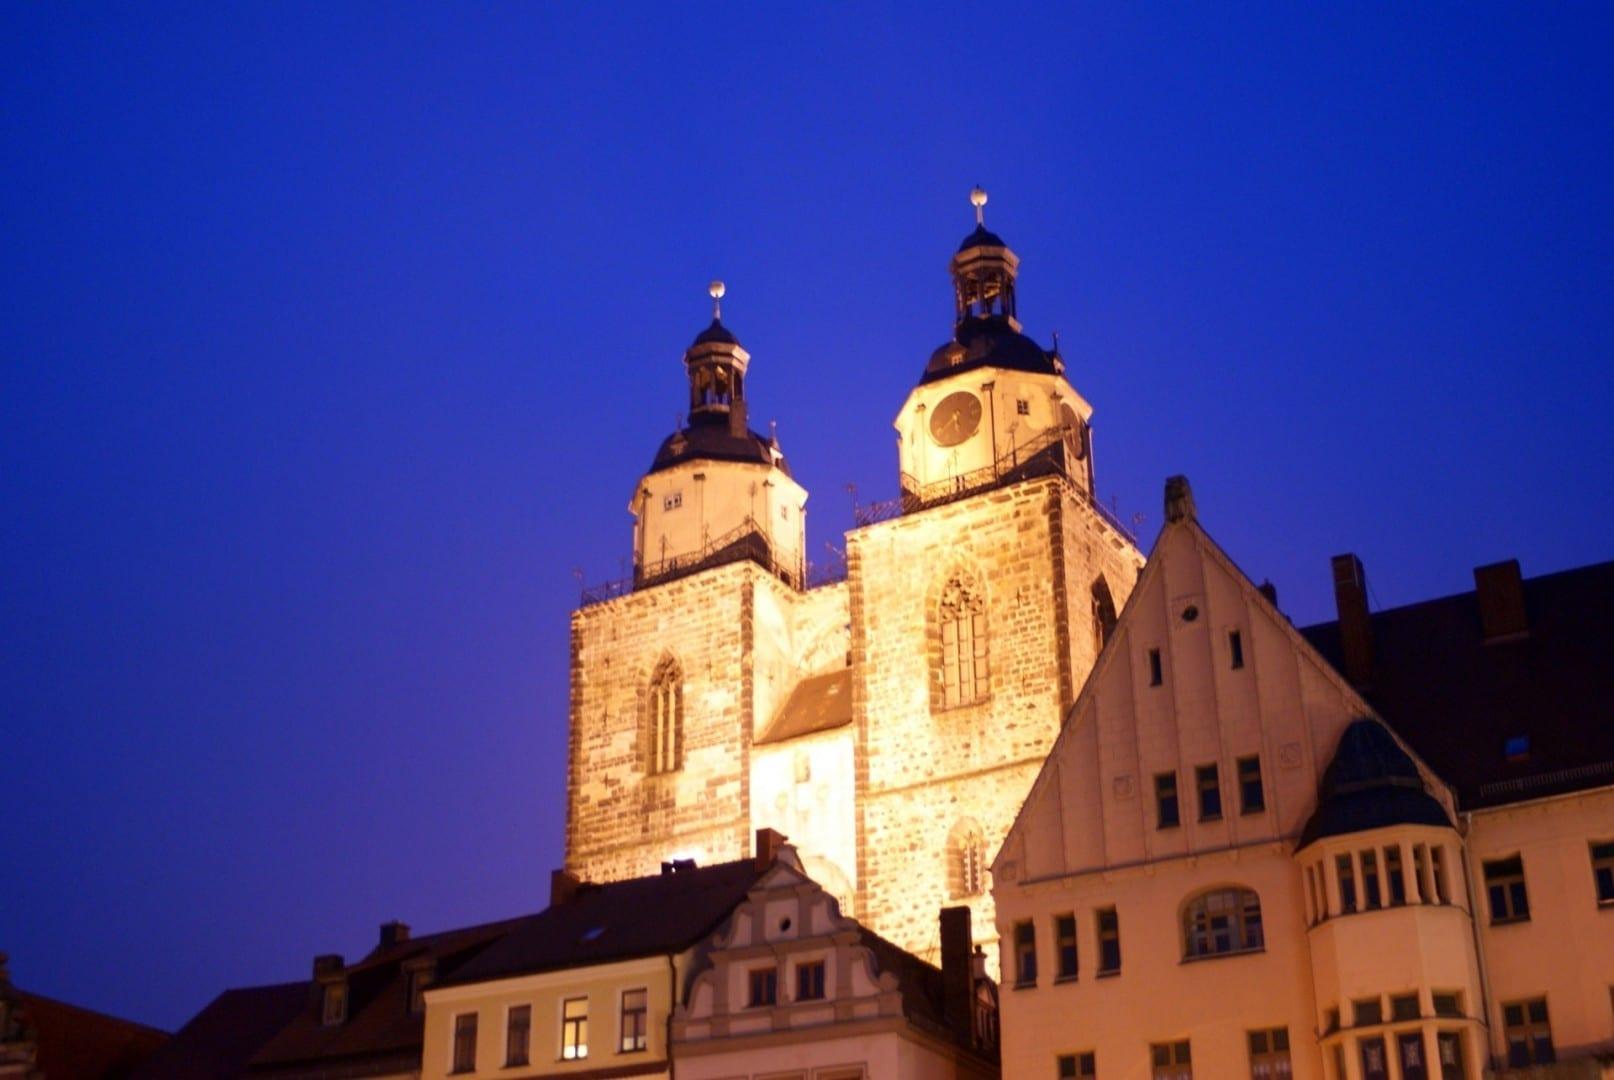 Iglesia de la ciudad (Citychurch) Wittenberg Alemania